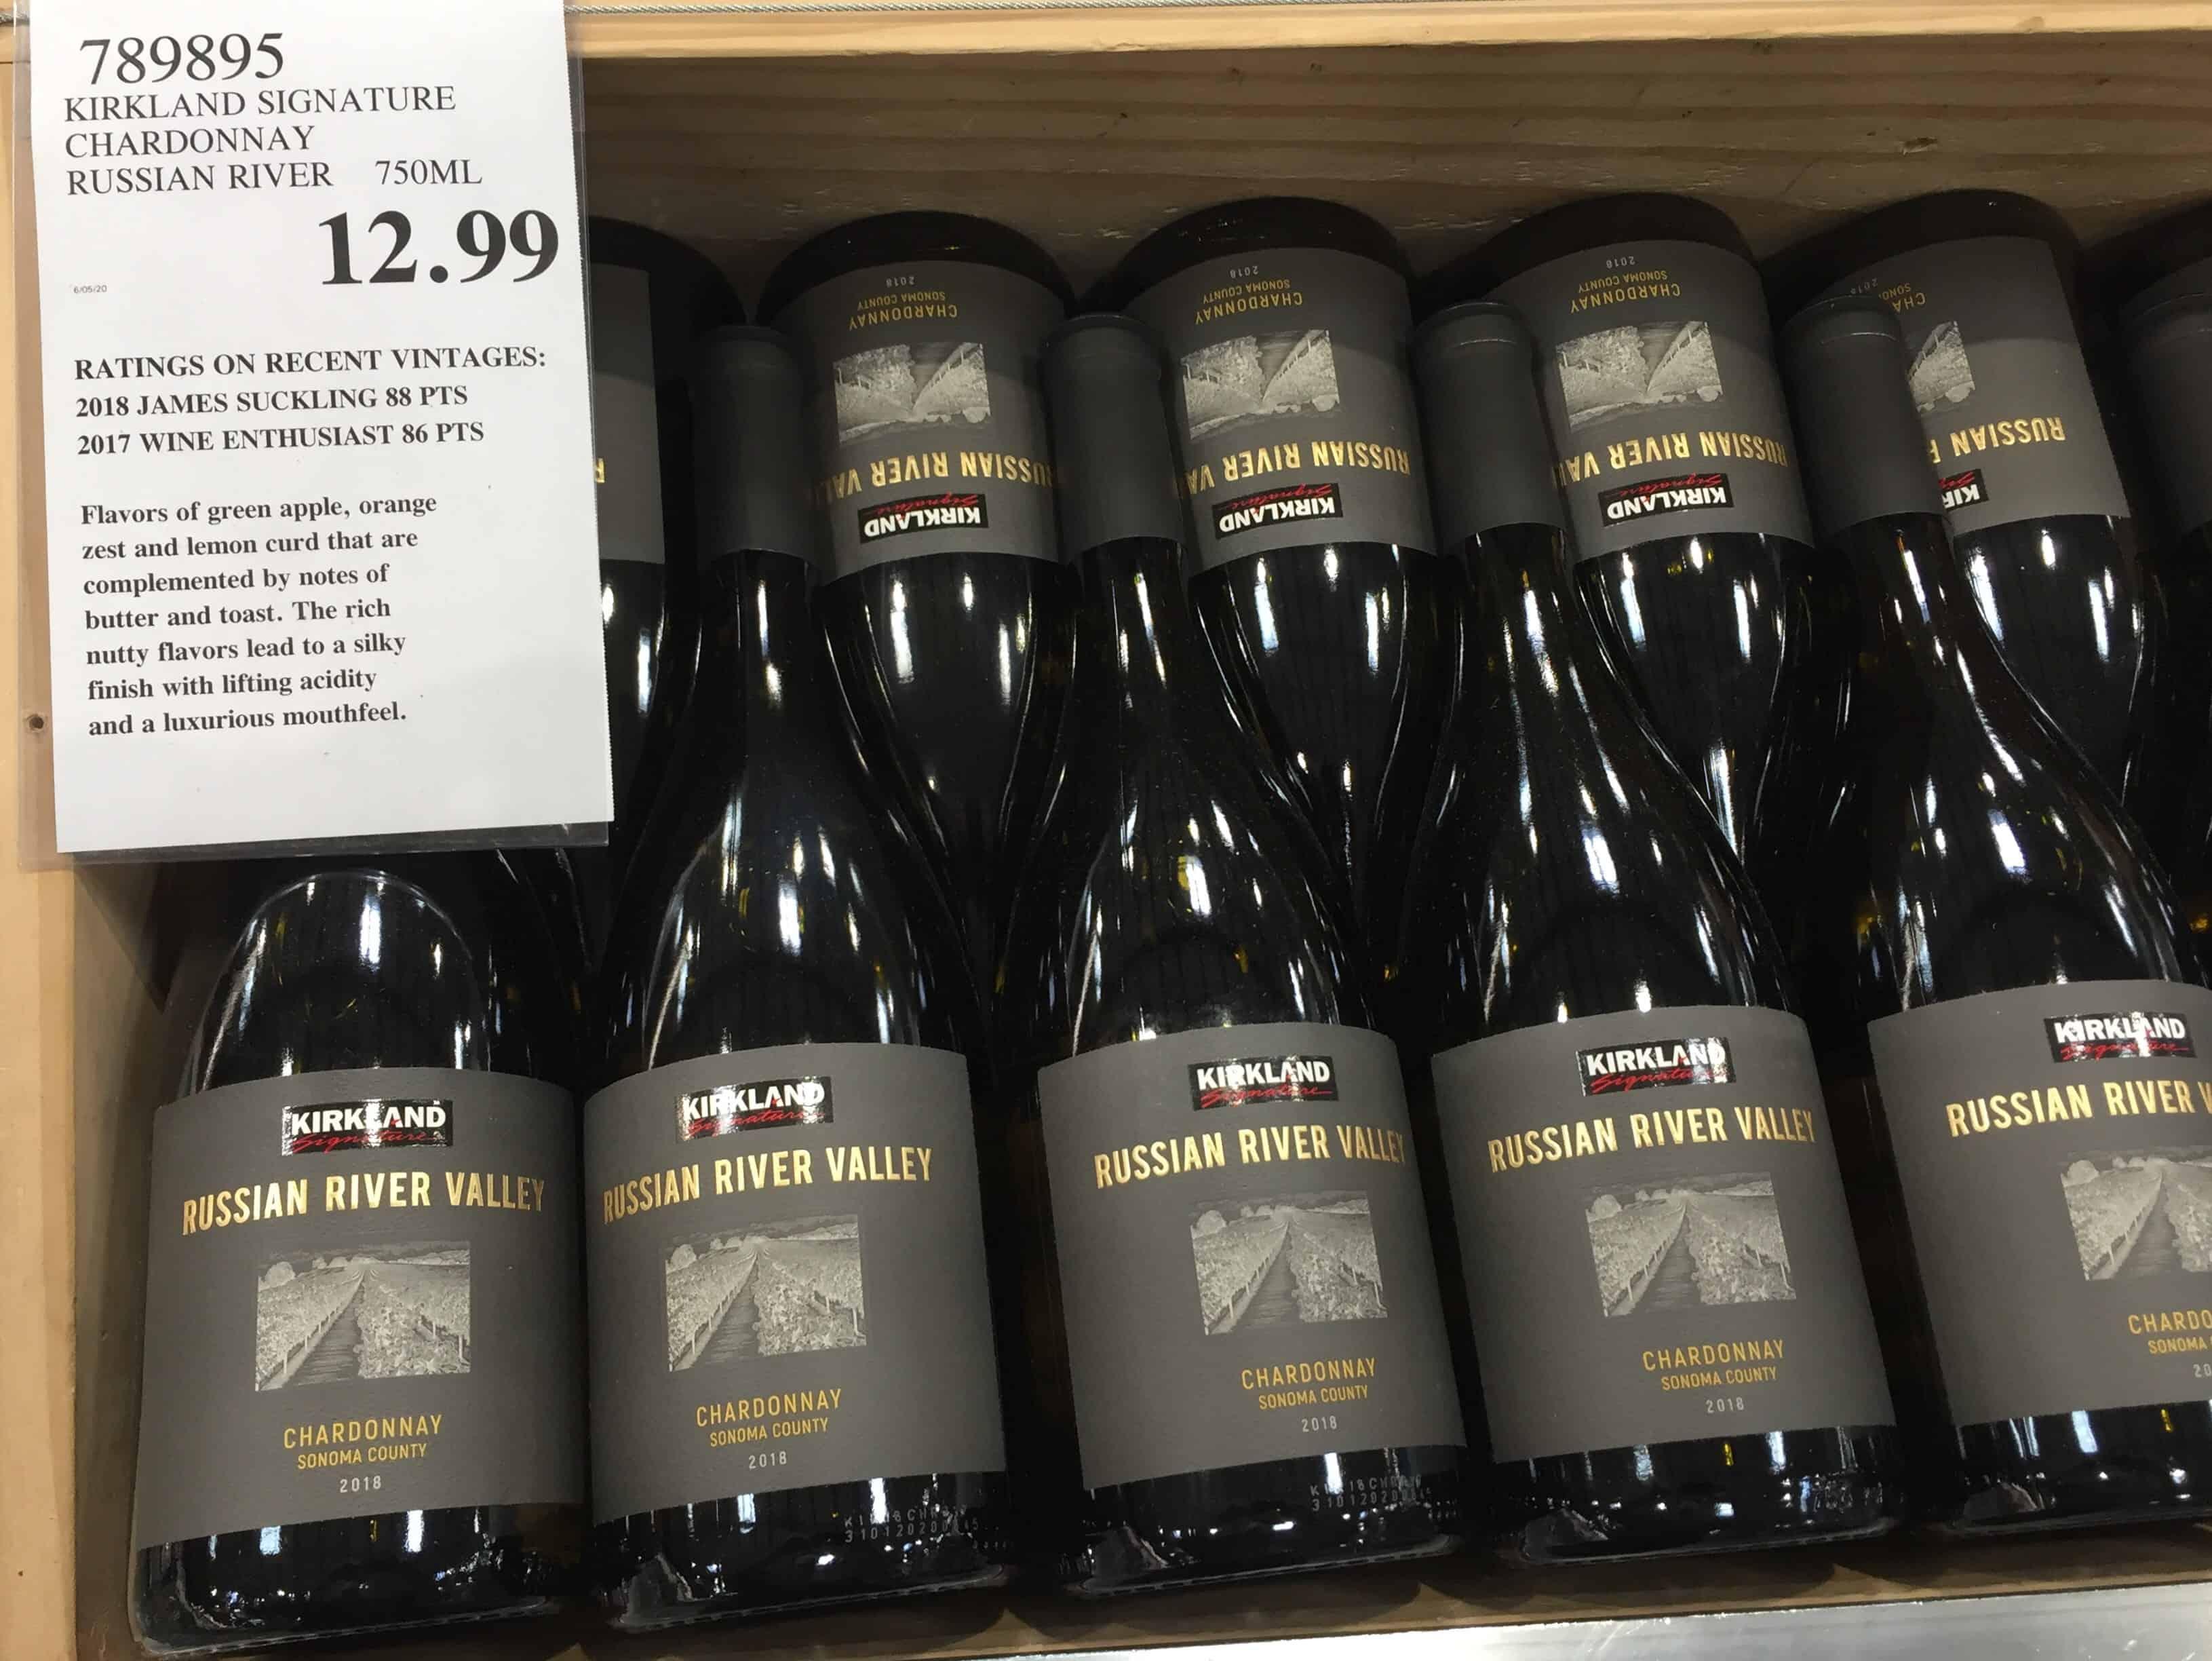 Costco wine bin, chock full o' KS Russian River Valley Chardonnay